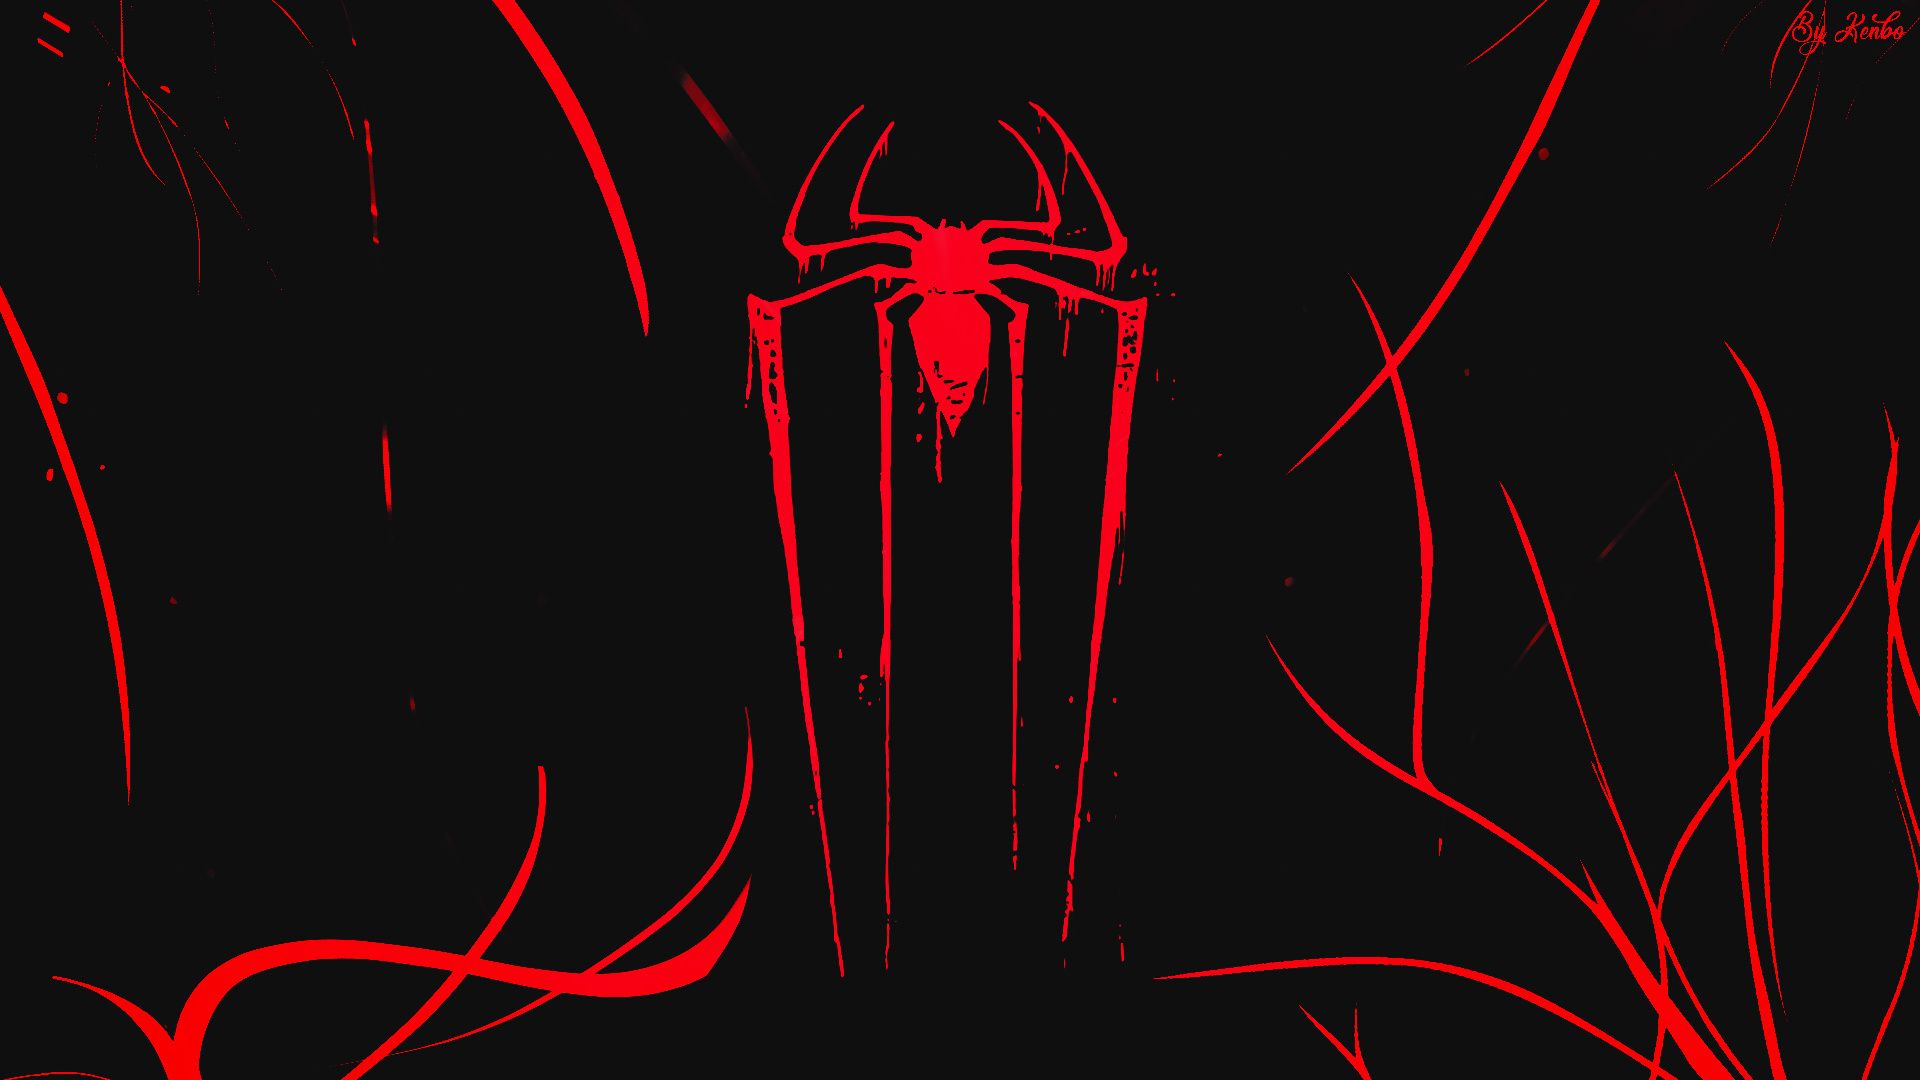 Logo, minimal, spider-man, dark, 1920x1080 wallpaper